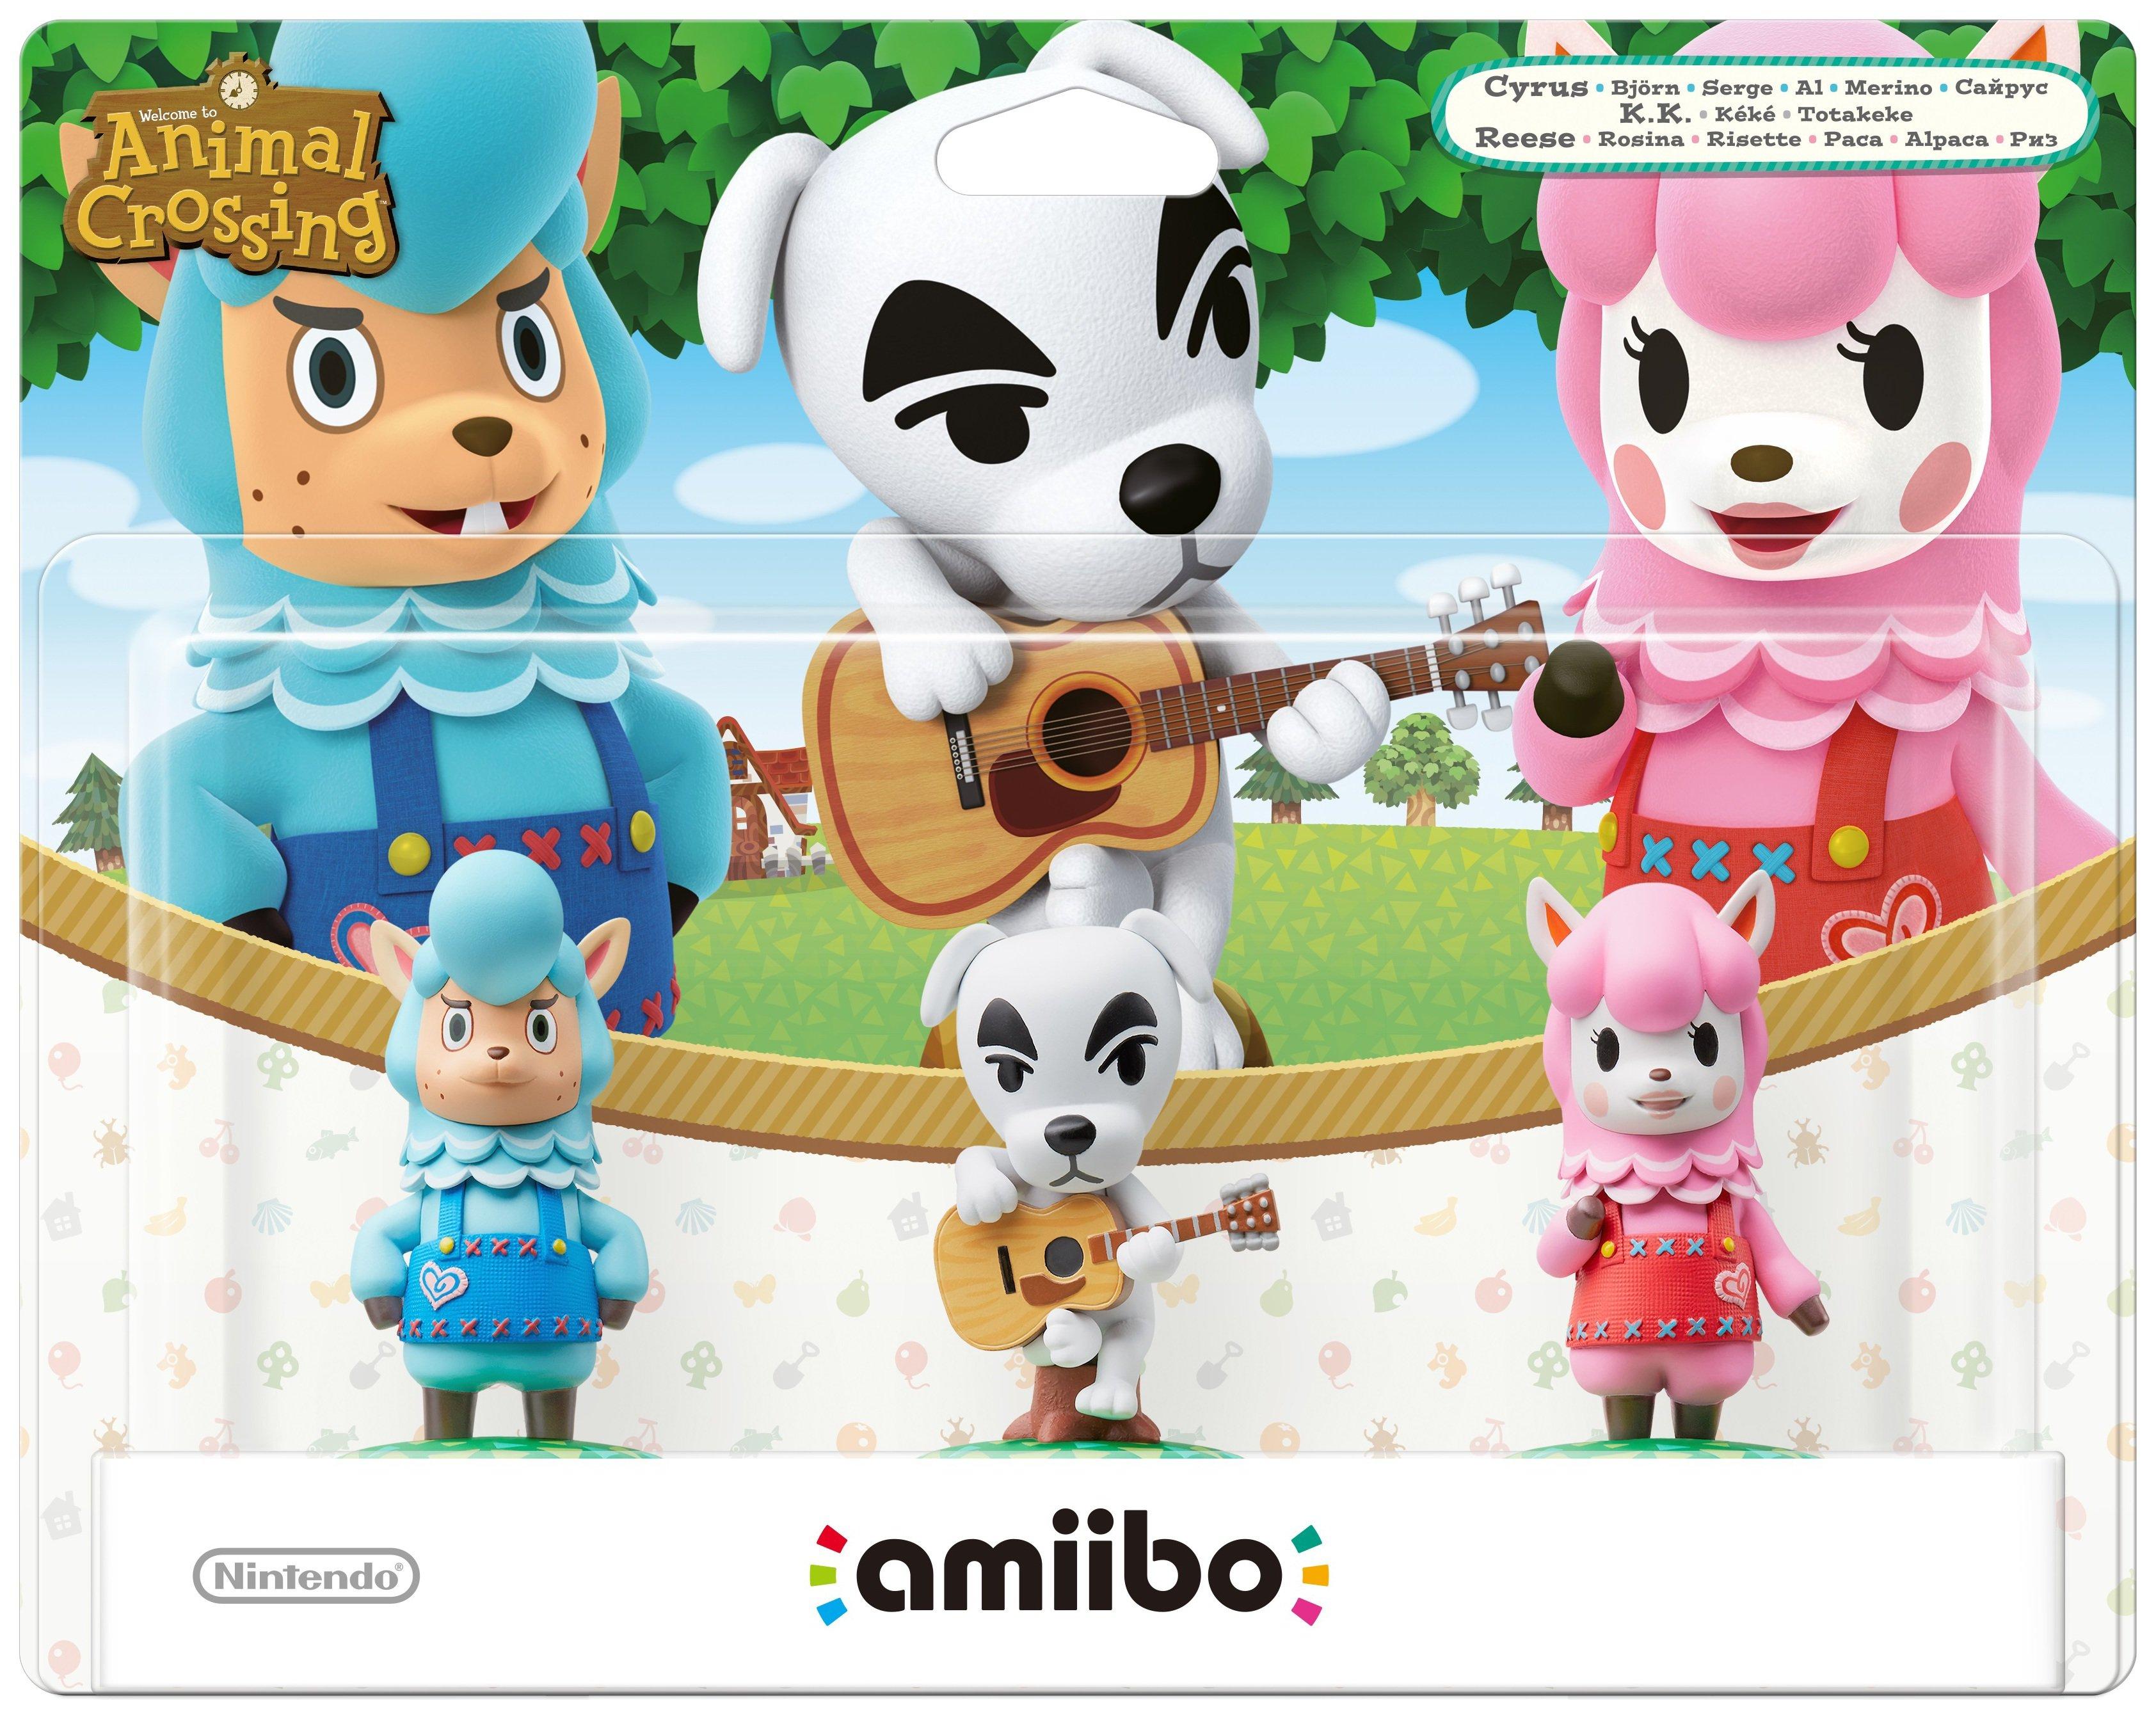 amiibo Animal Crossing 3 Pack - Reese, K.K. Slider, Cyrus